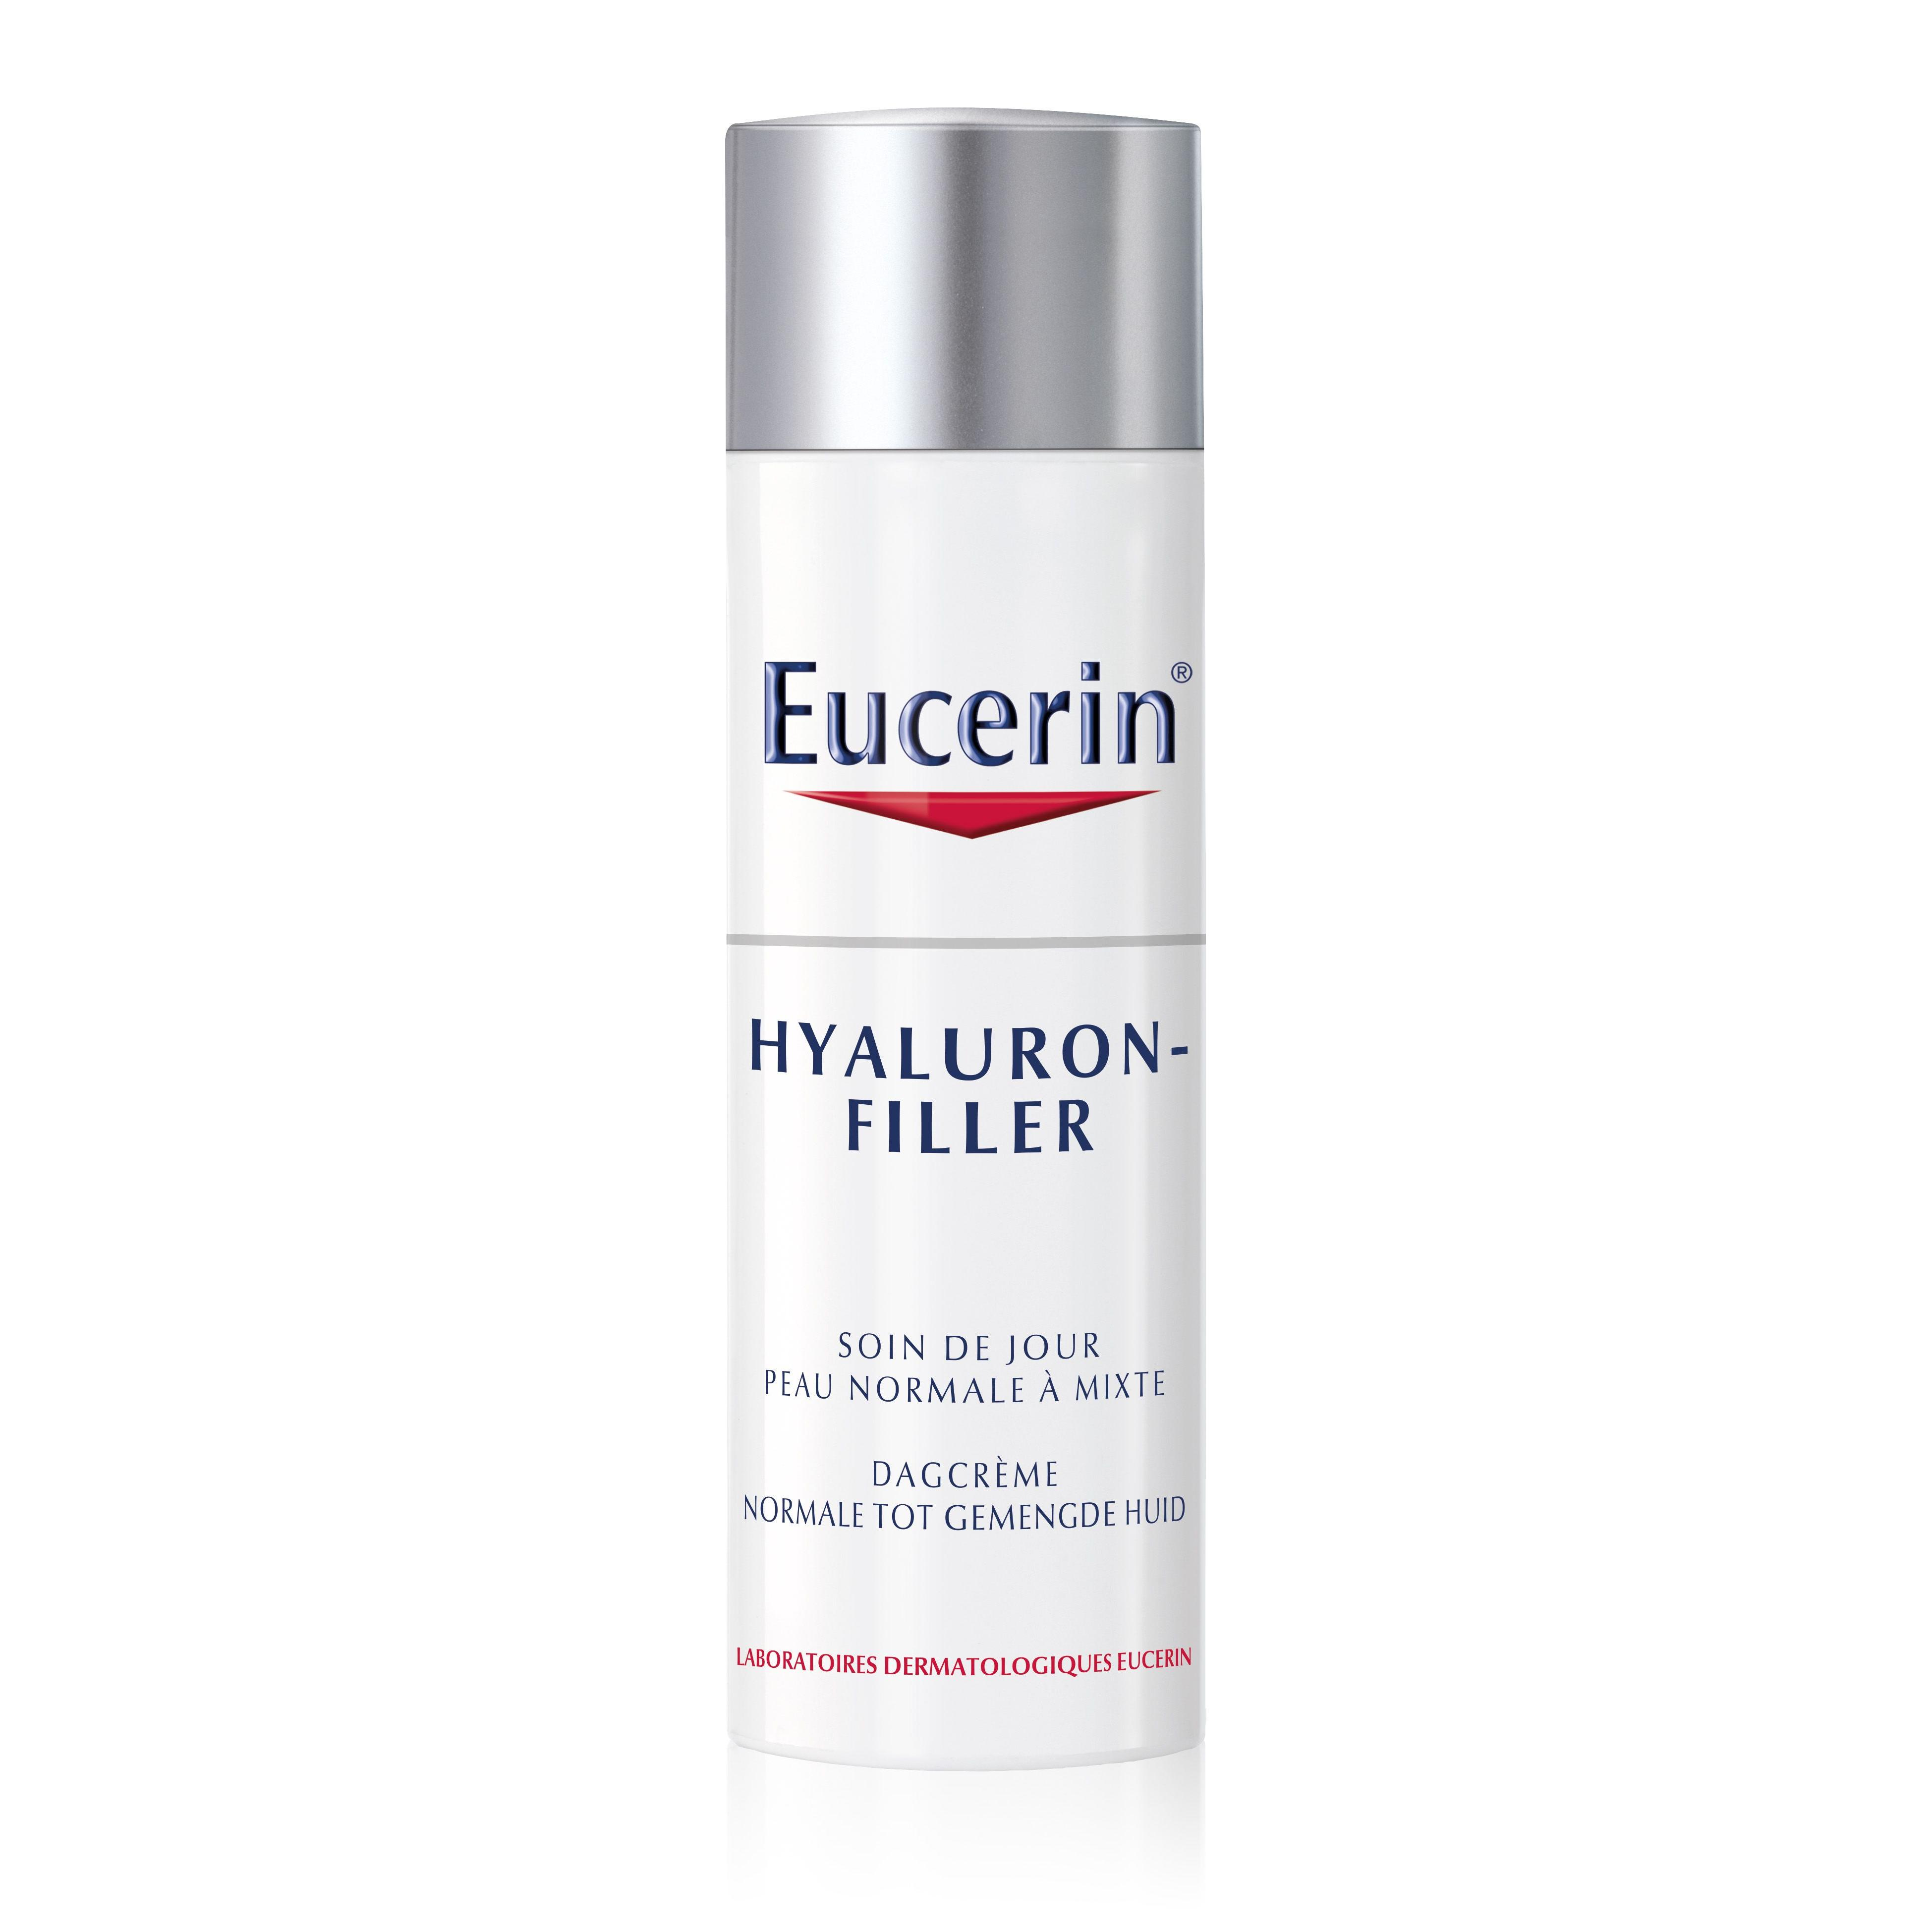 Eucerin Hyalur Fill Dagcrm Lt 50ml